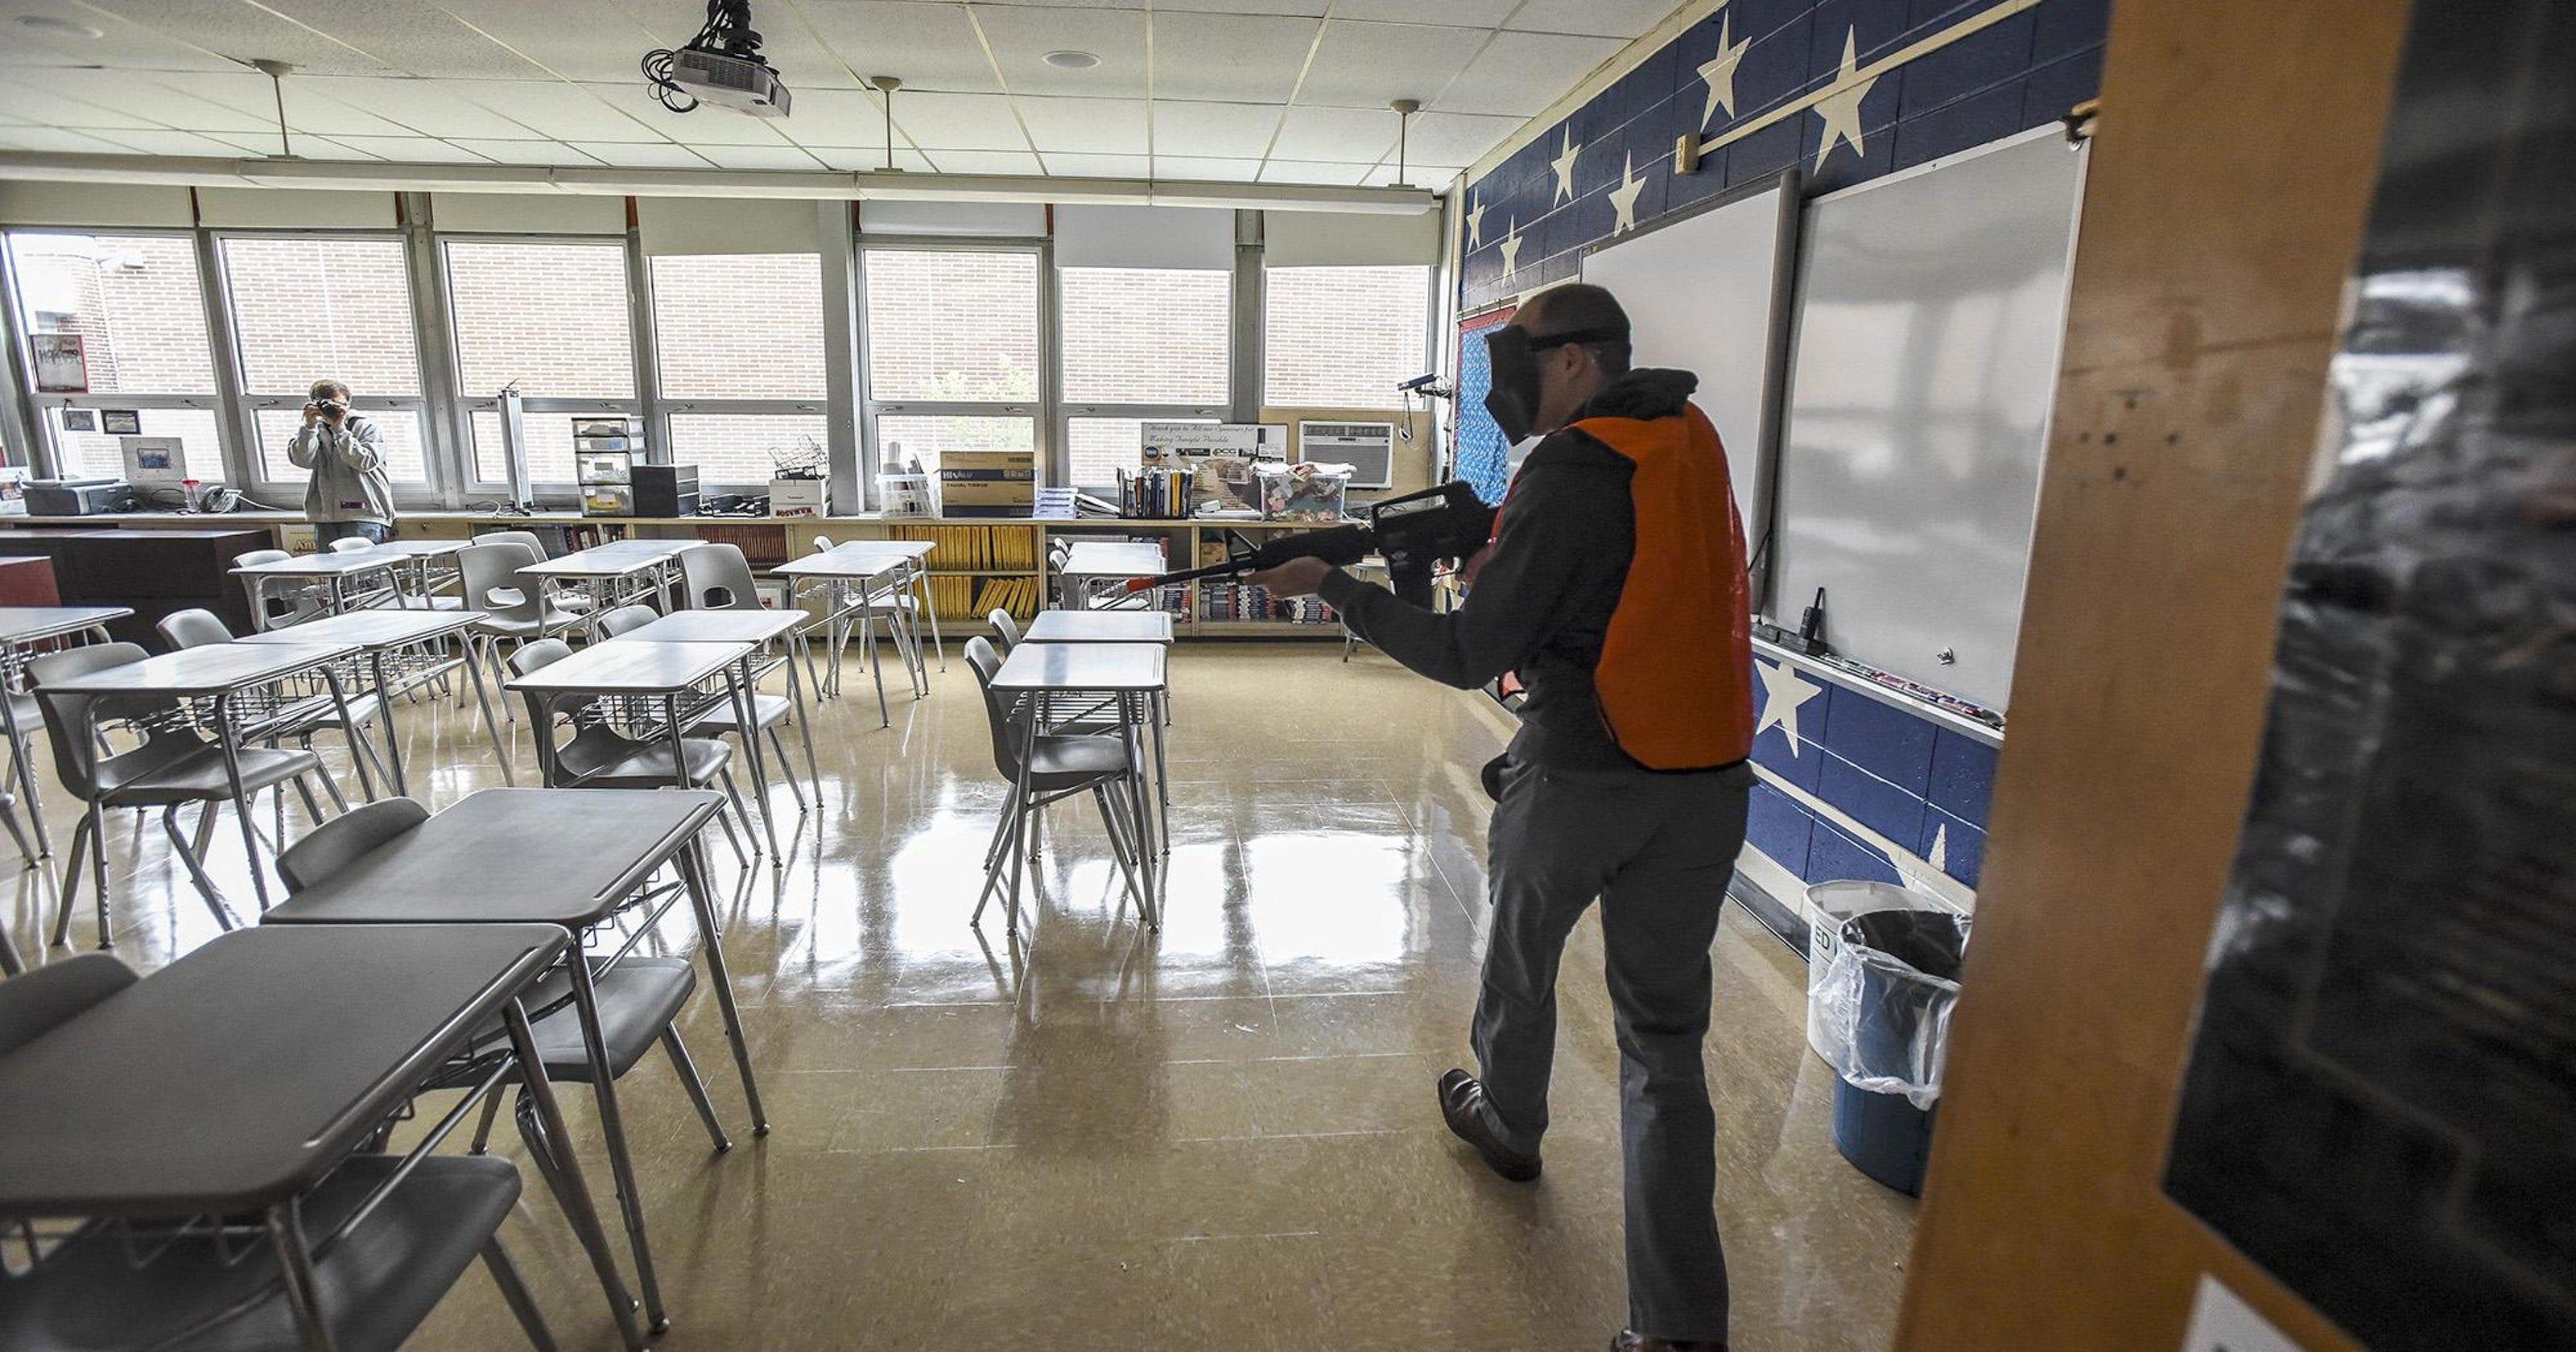 Denville school shooter drill goes beyond lockdown